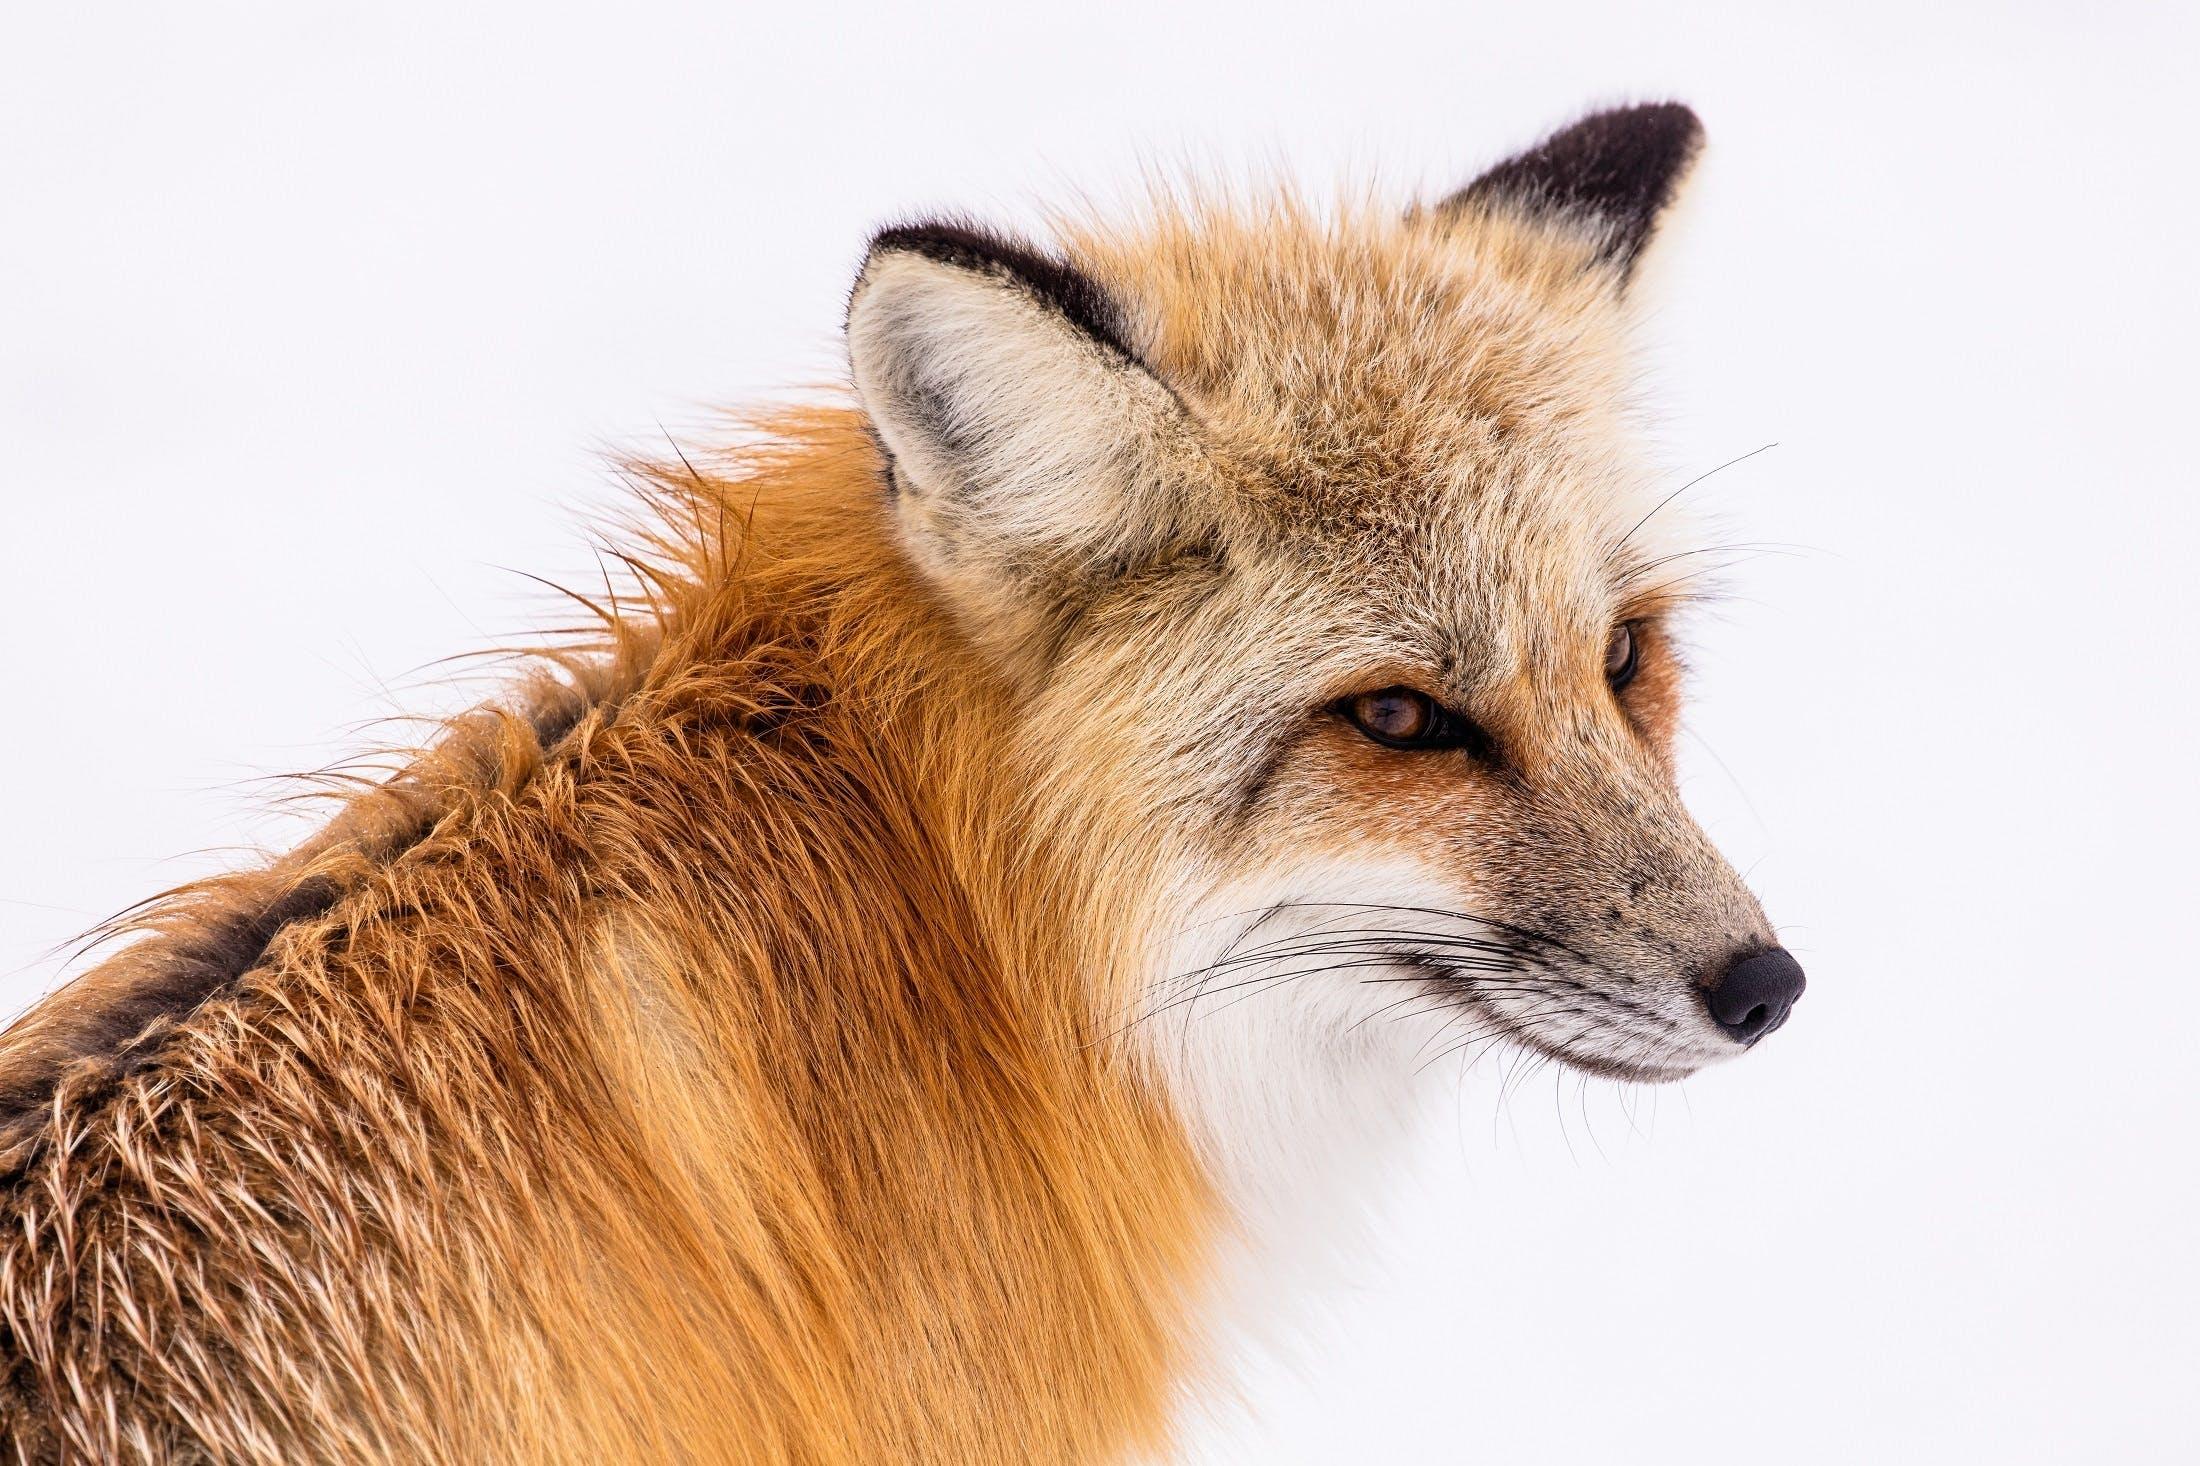 Free stock photo of carnivore, close up, furry, hunter